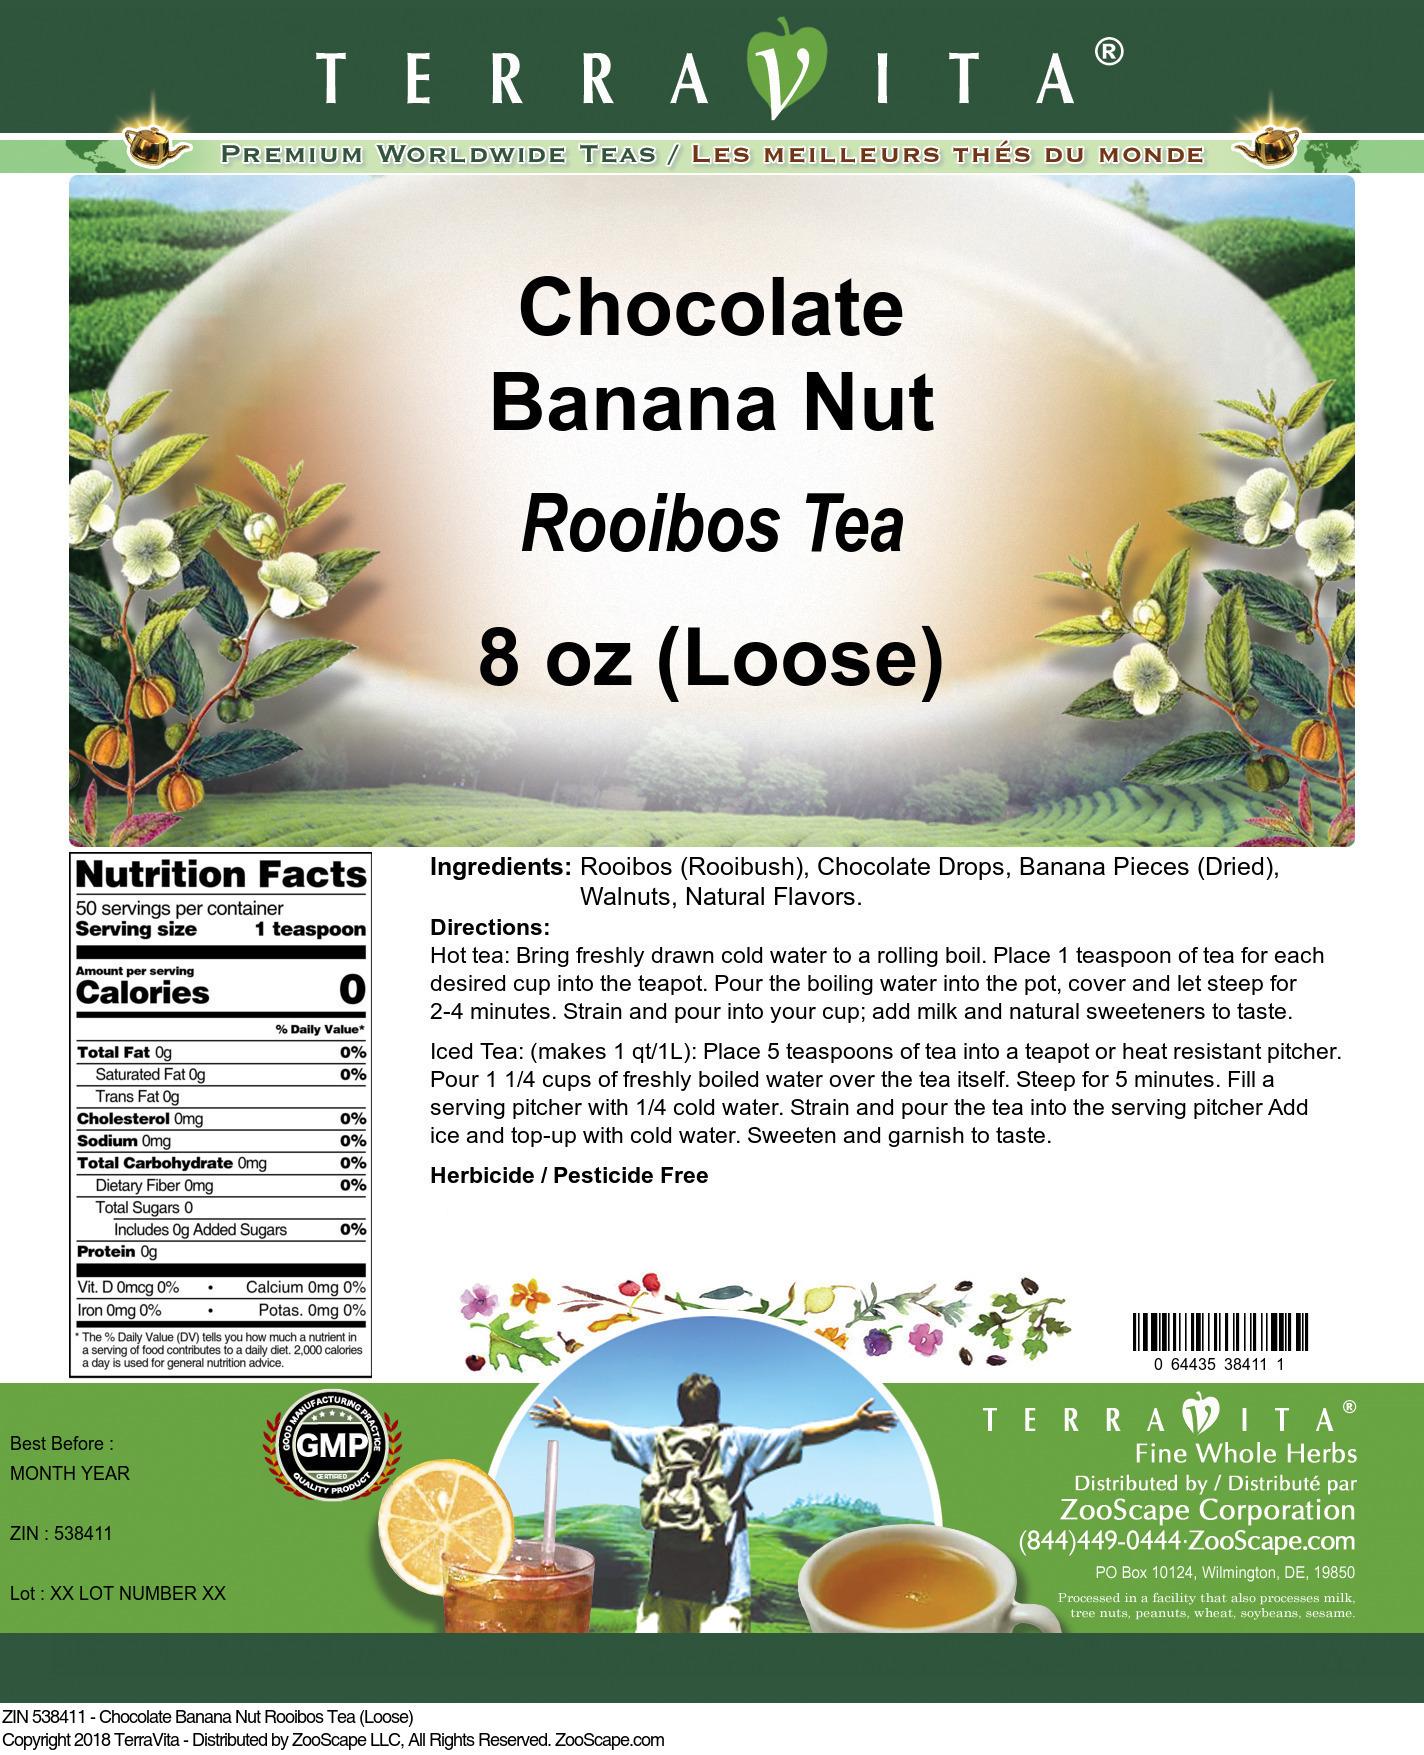 Chocolate Banana Nut Rooibos Tea